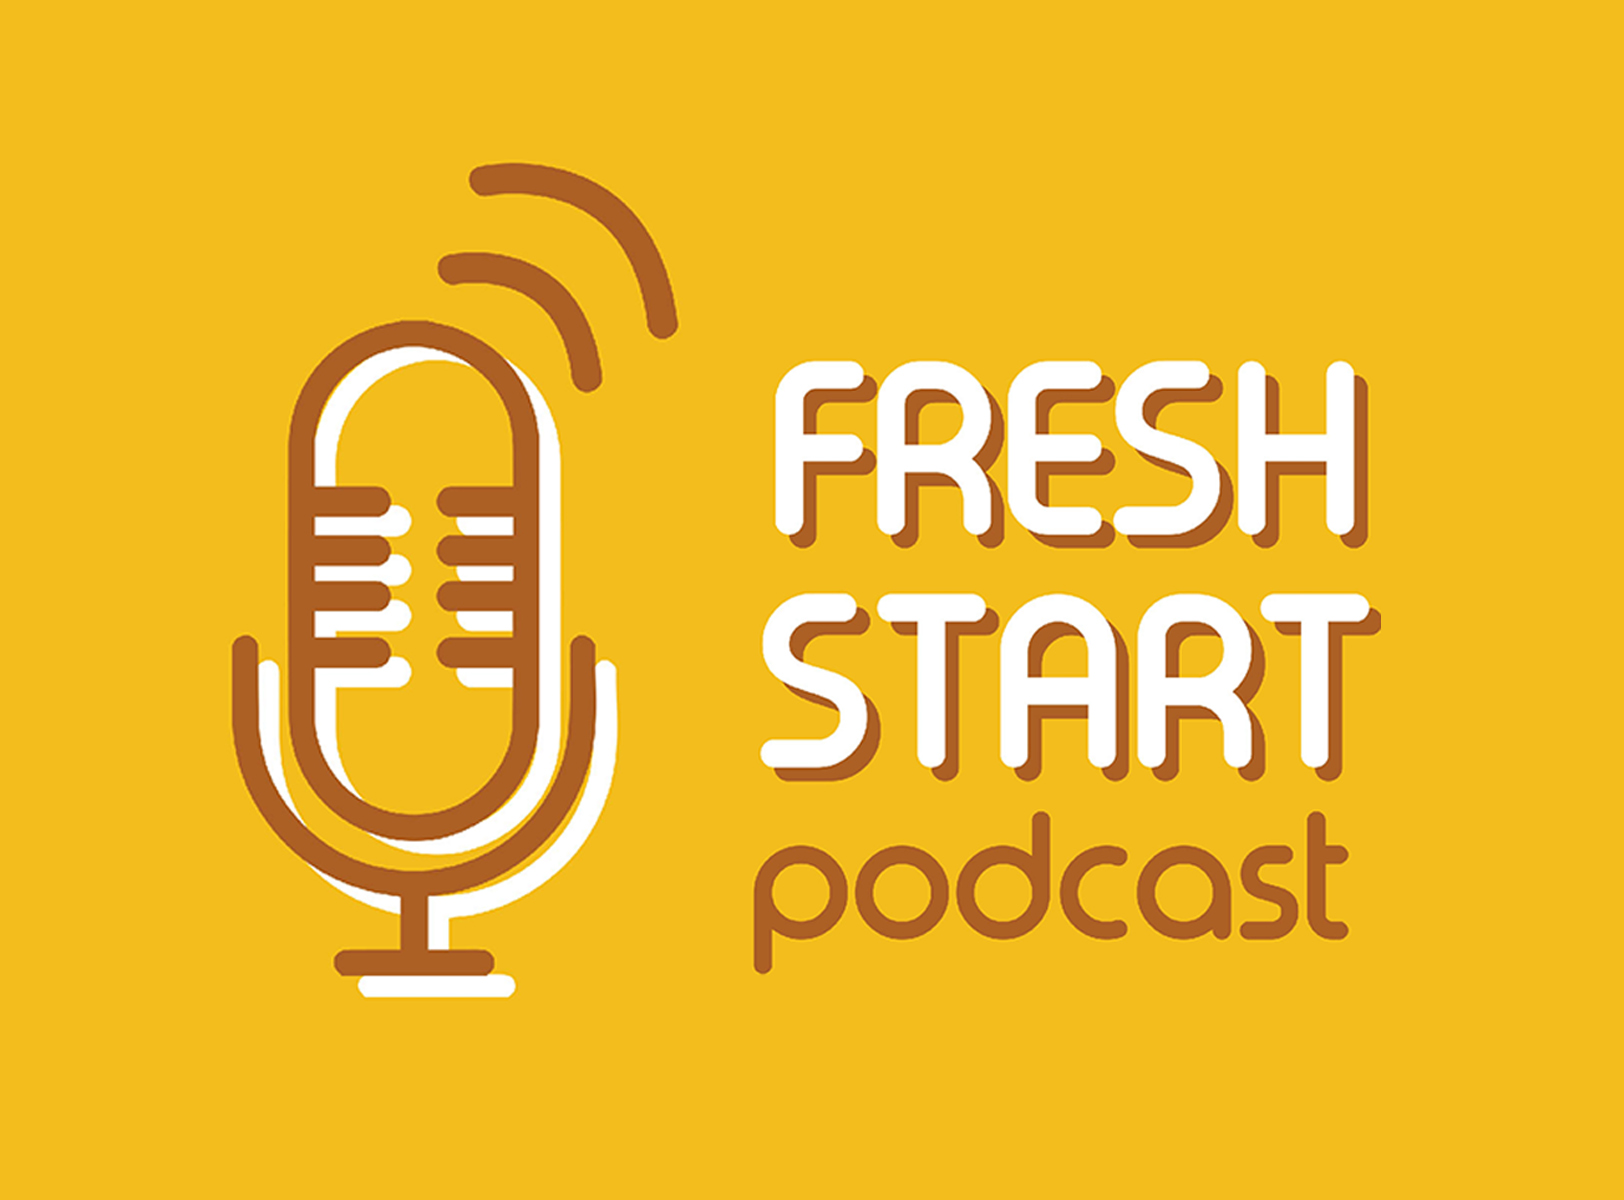 Fresh Start: Podcast News (1/14/2020 Tue.)